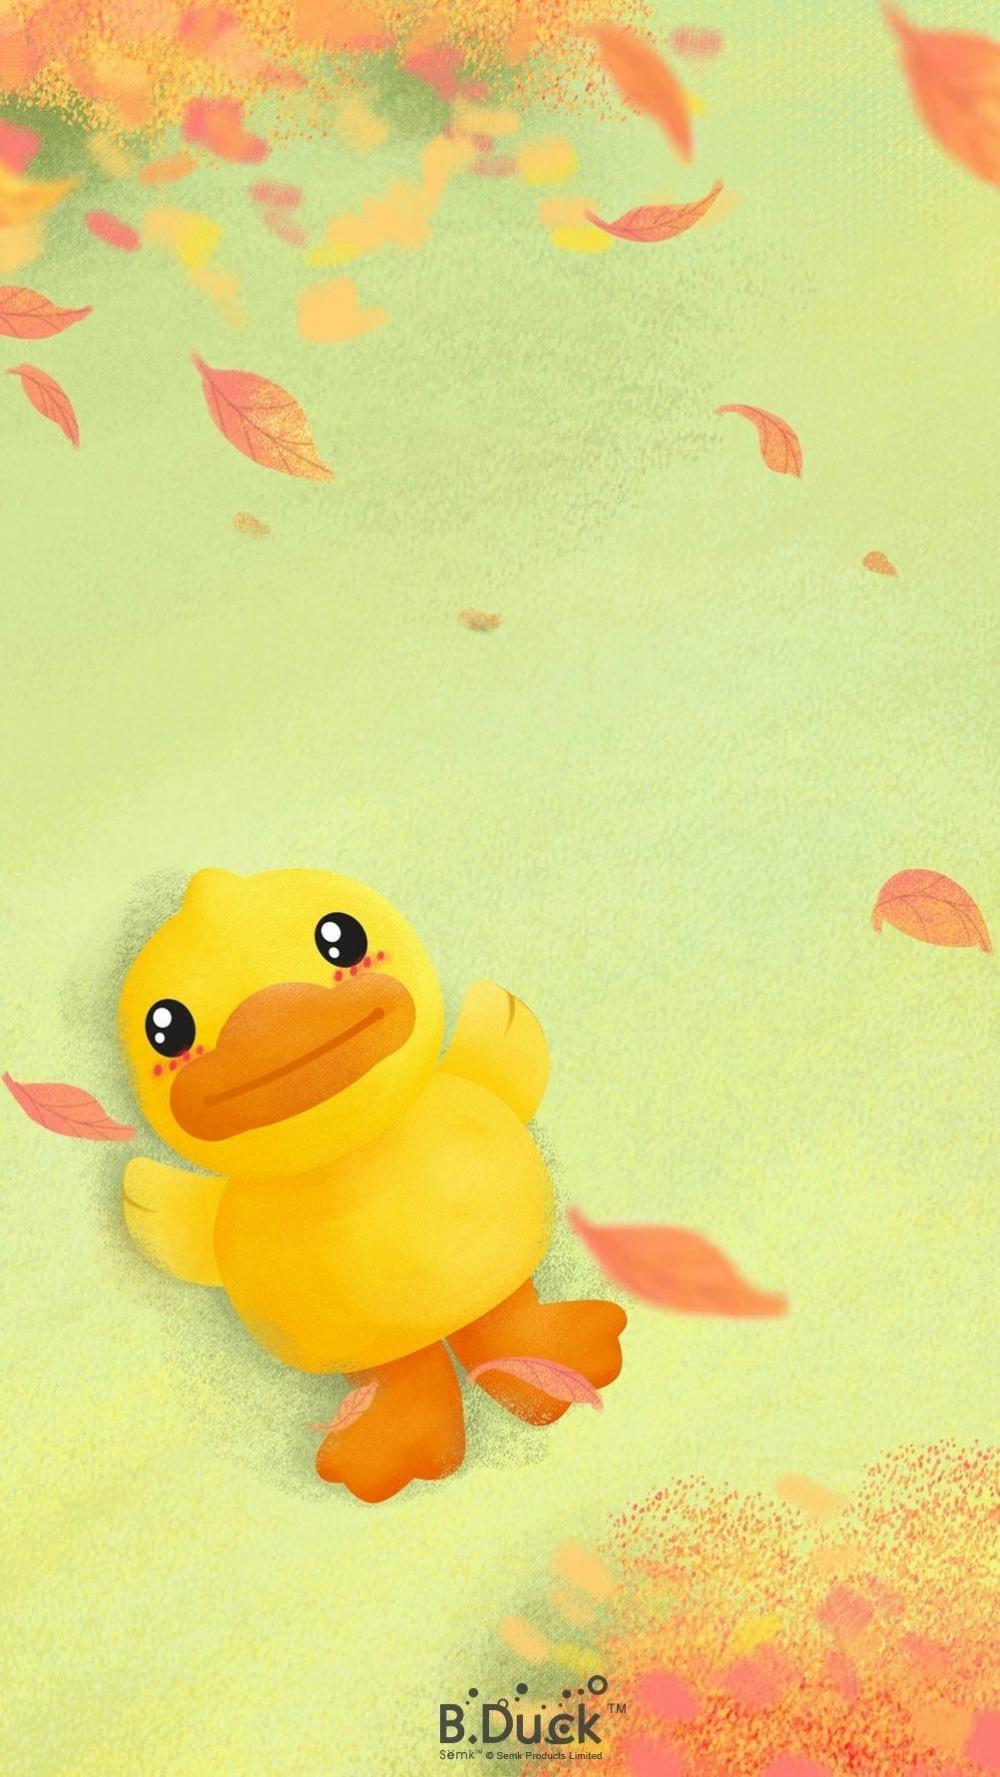 Pin By Sarah Meyers On Cartoon Cute Disney Wallpaper Duck Wallpaper Cartoon Art Styles